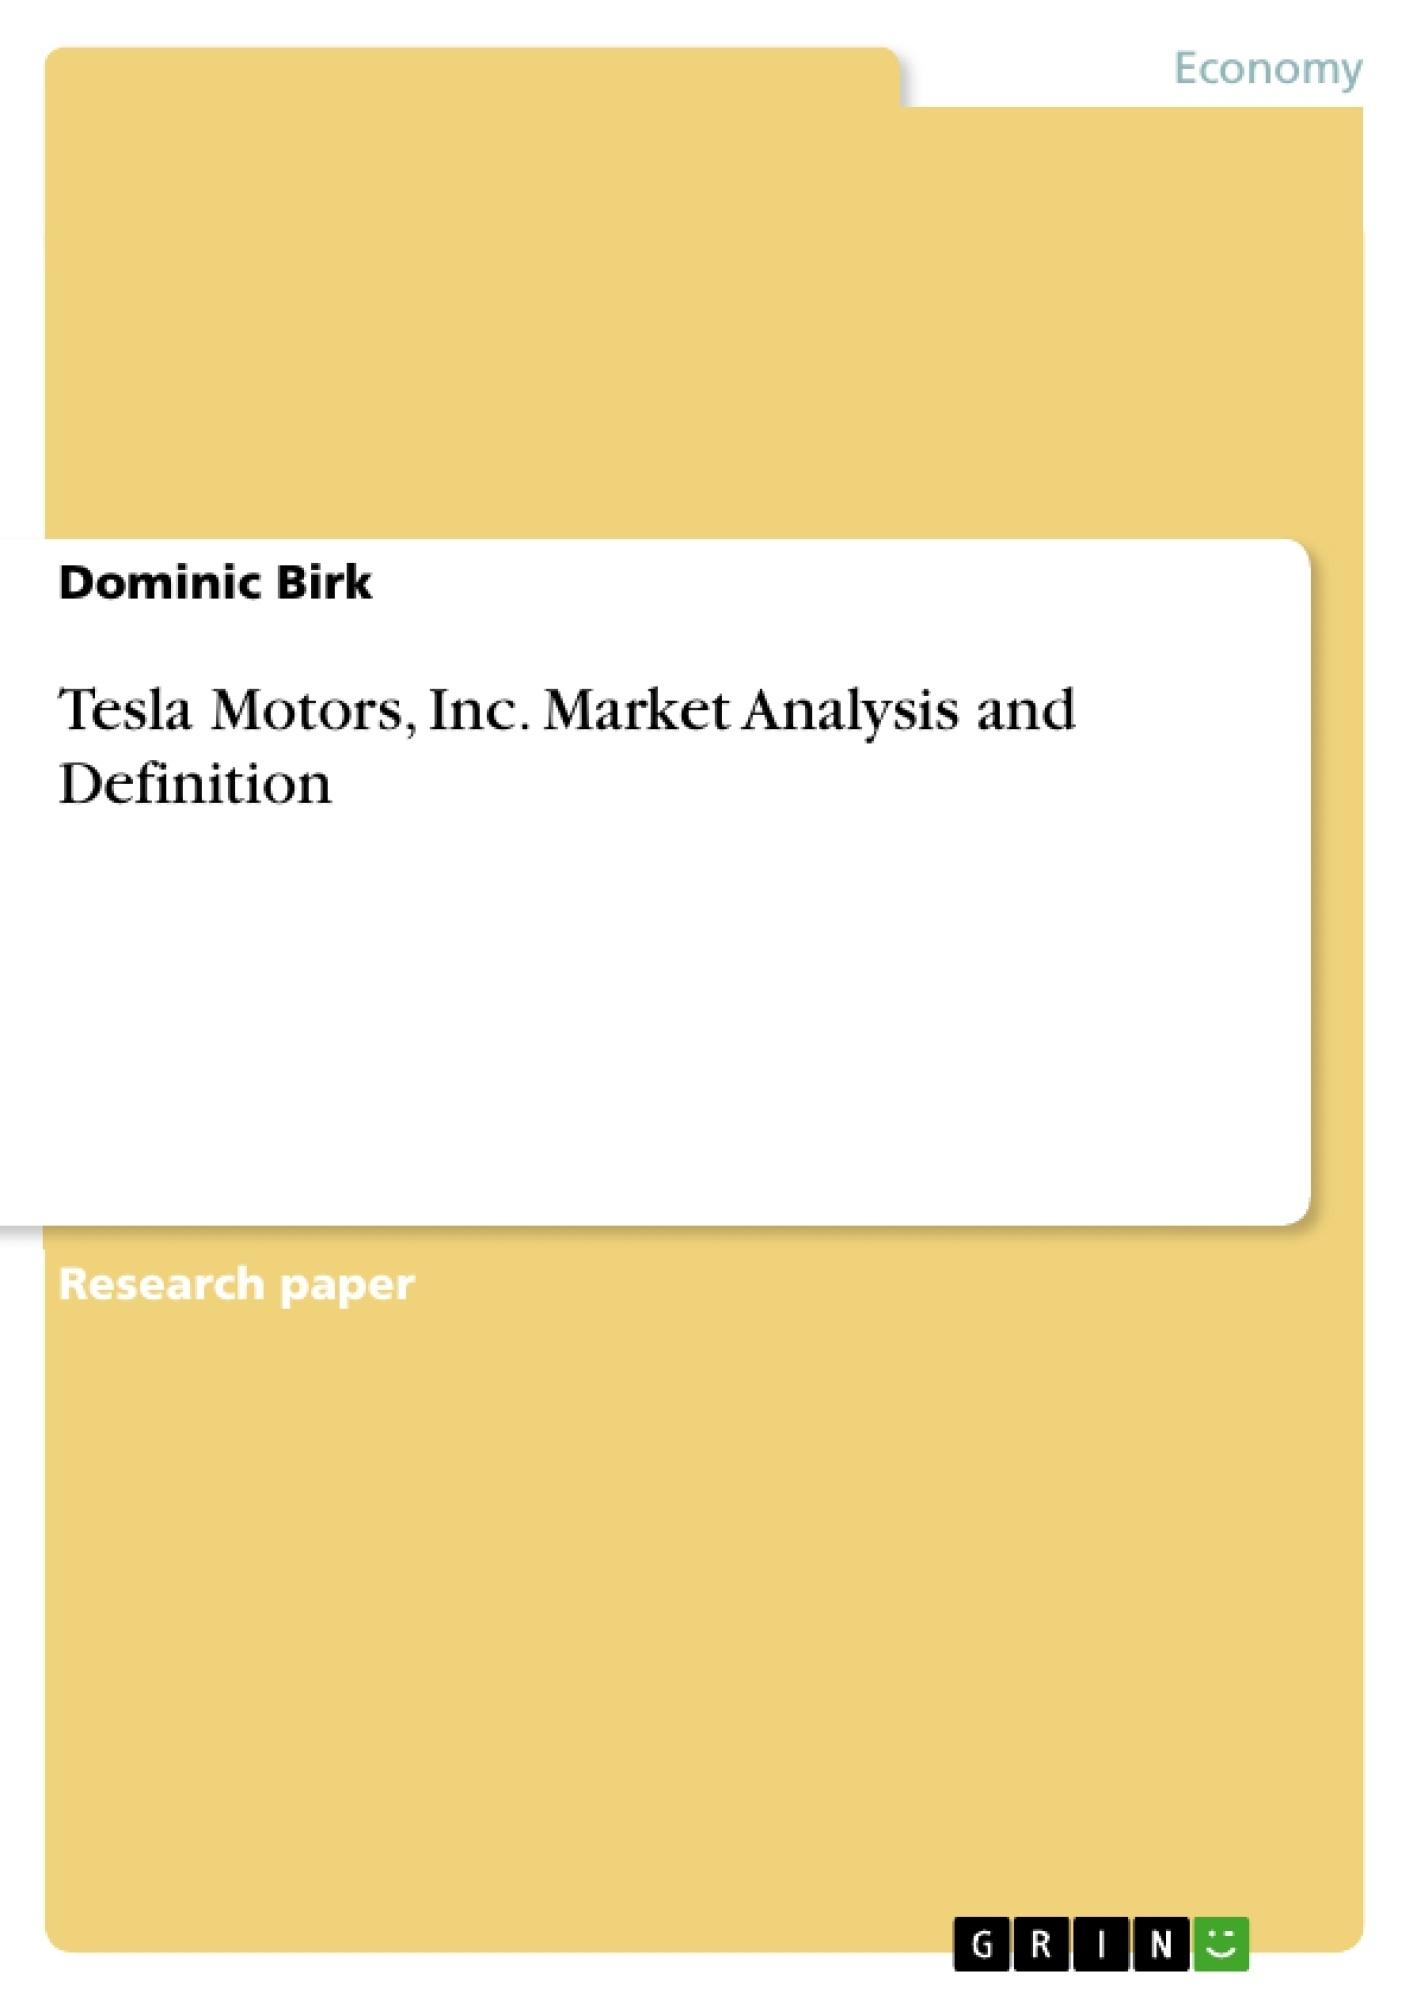 Title: Tesla Motors, Inc. Market Analysis and Definition